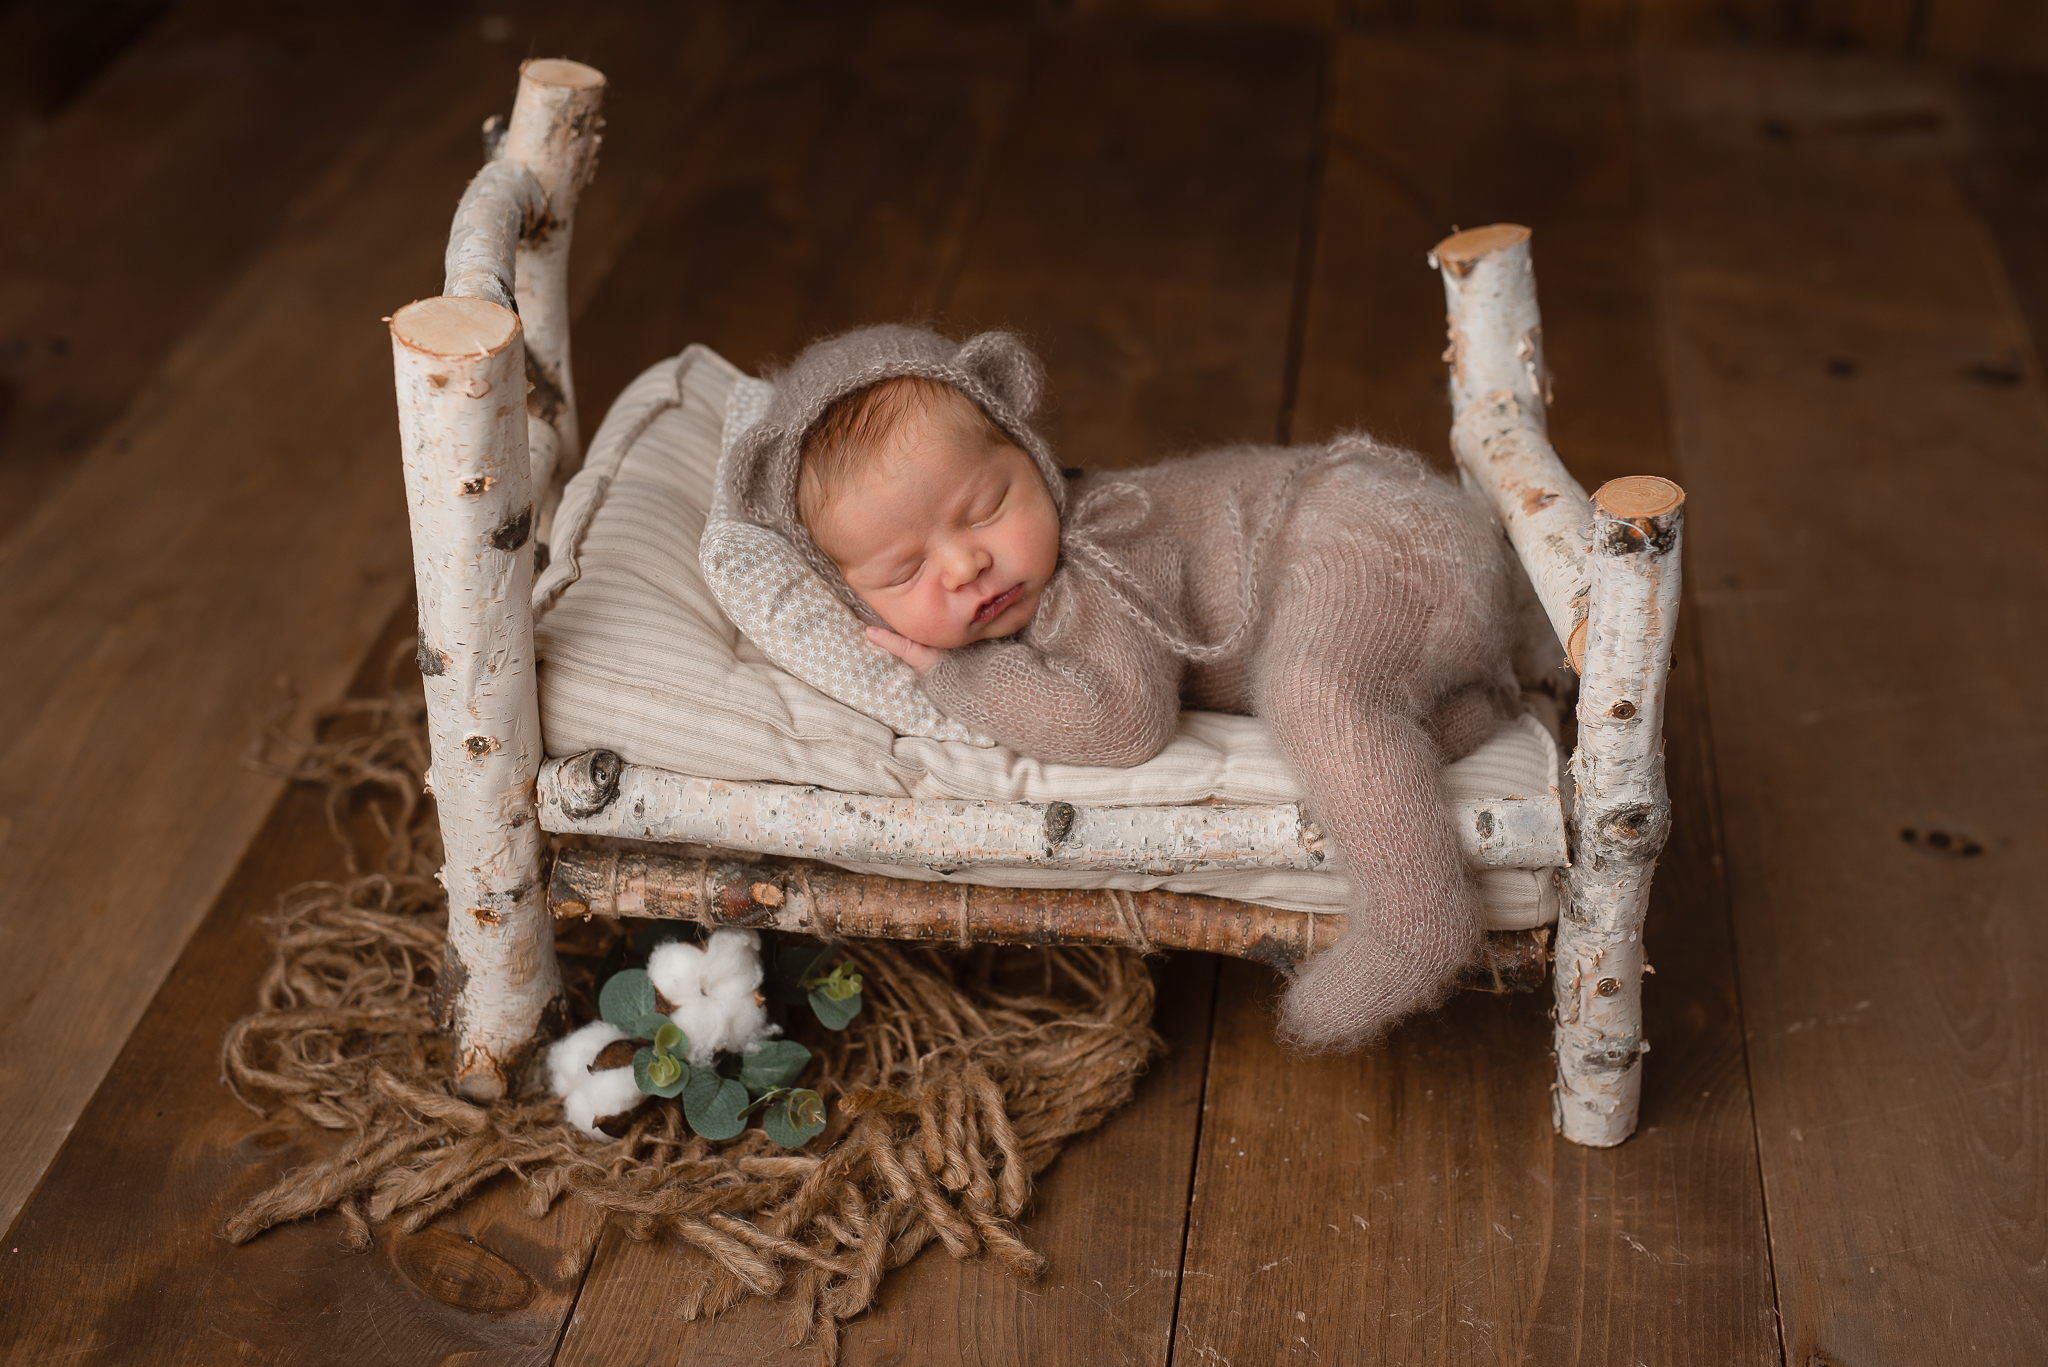 Newborn111NaomiLuciennePhotography062019-2-Edit.jpg